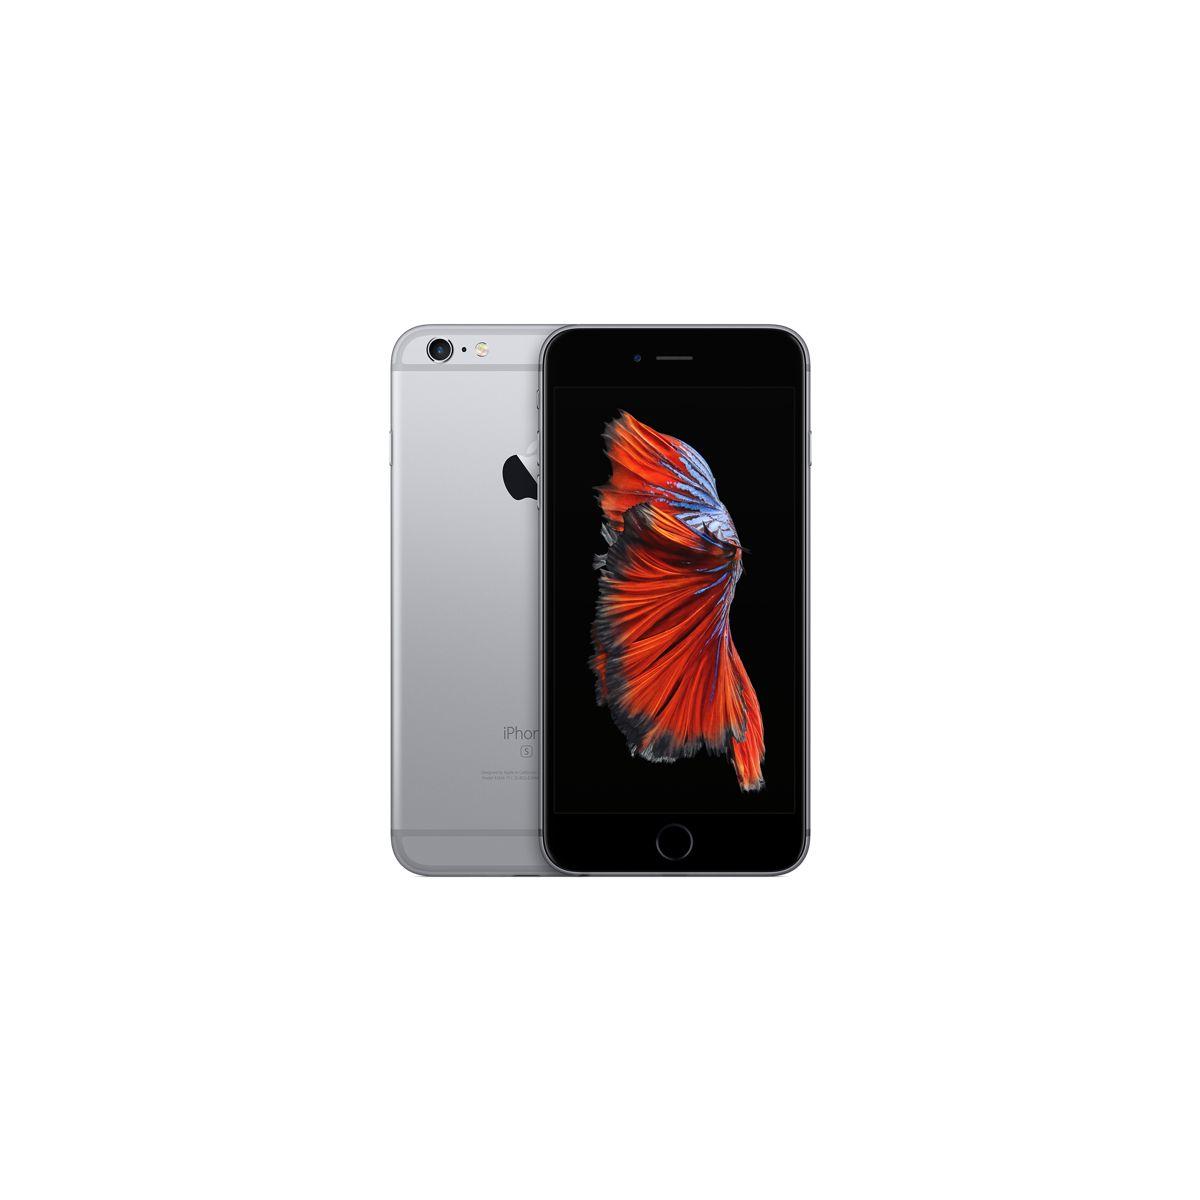 APPLE iPhone 6S Plus 128Go Gris sidéral (photo)